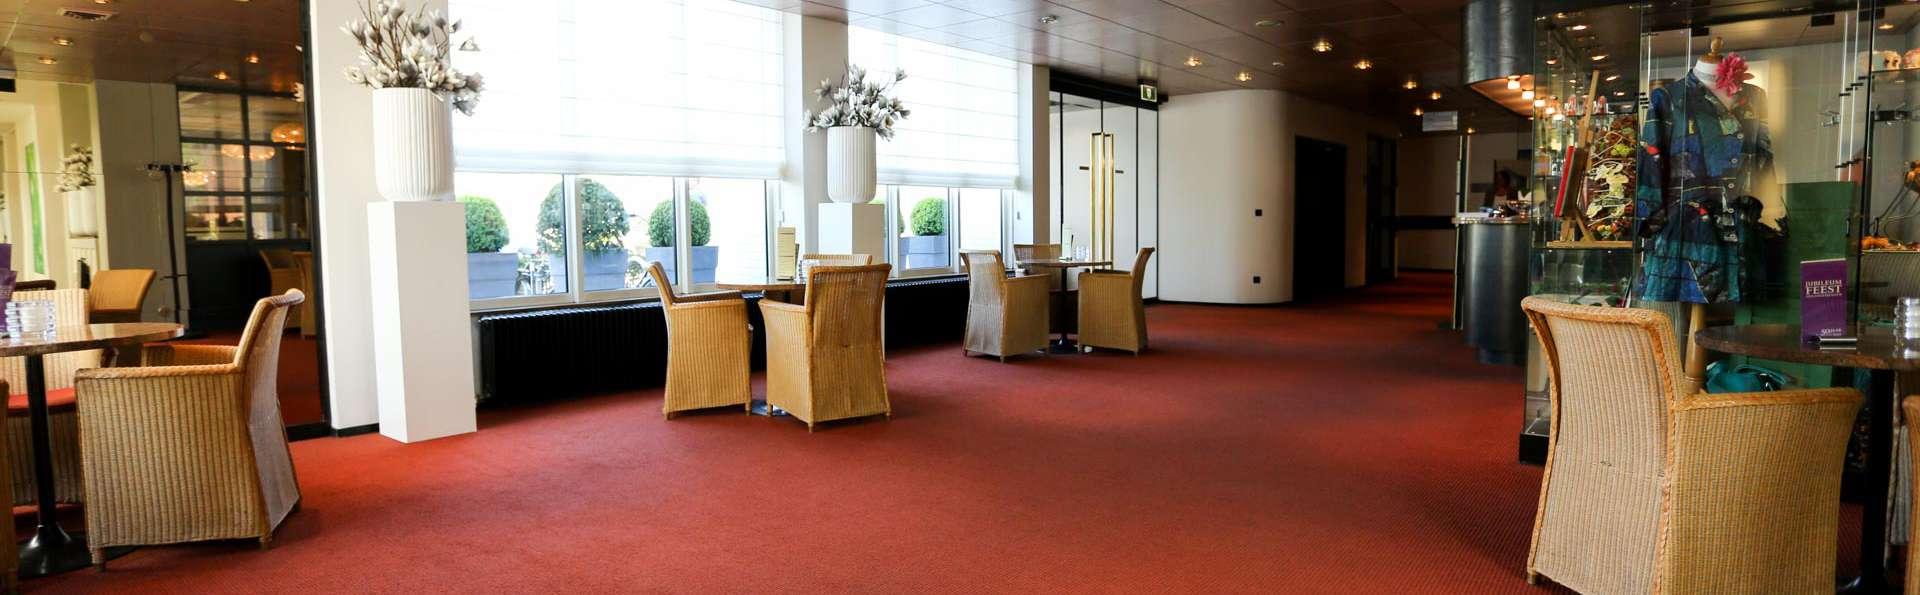 Hotel De Postelse Hoeve - EDIT_LOBBY_02.jpg